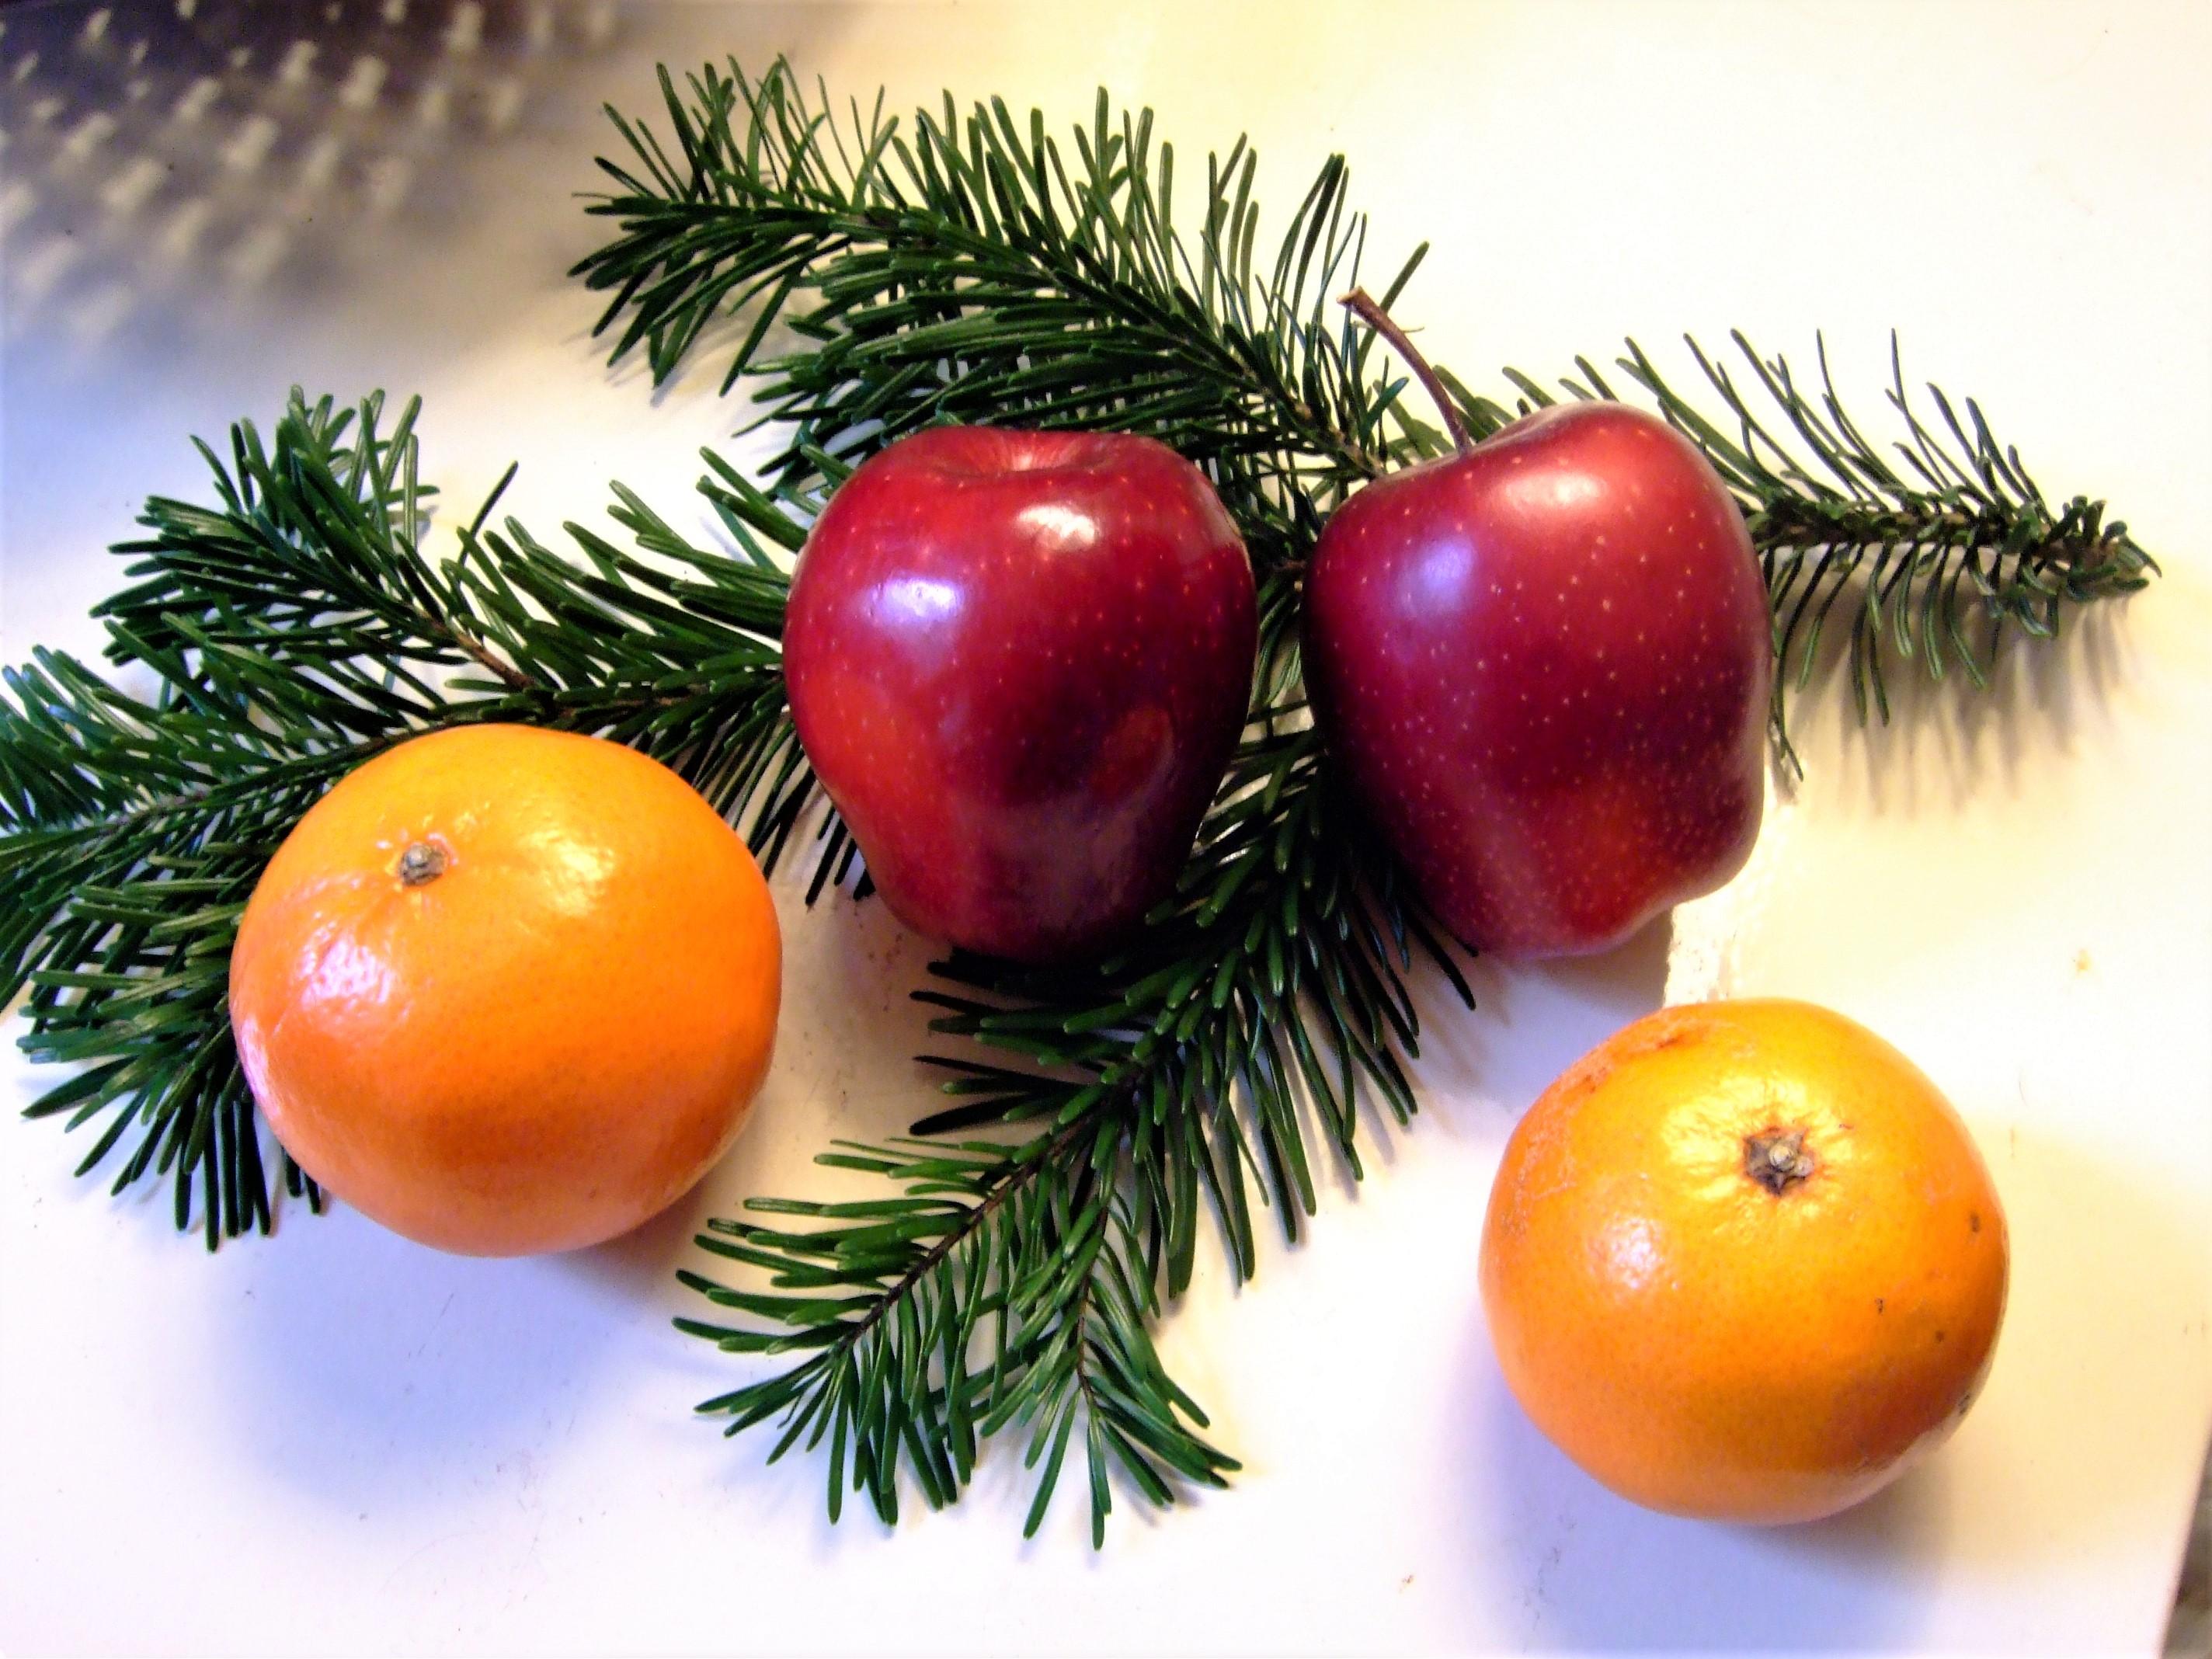 Christmas Tree Fruit Ornaments.Free Images Orange Natural Foods Fruit Vegetable